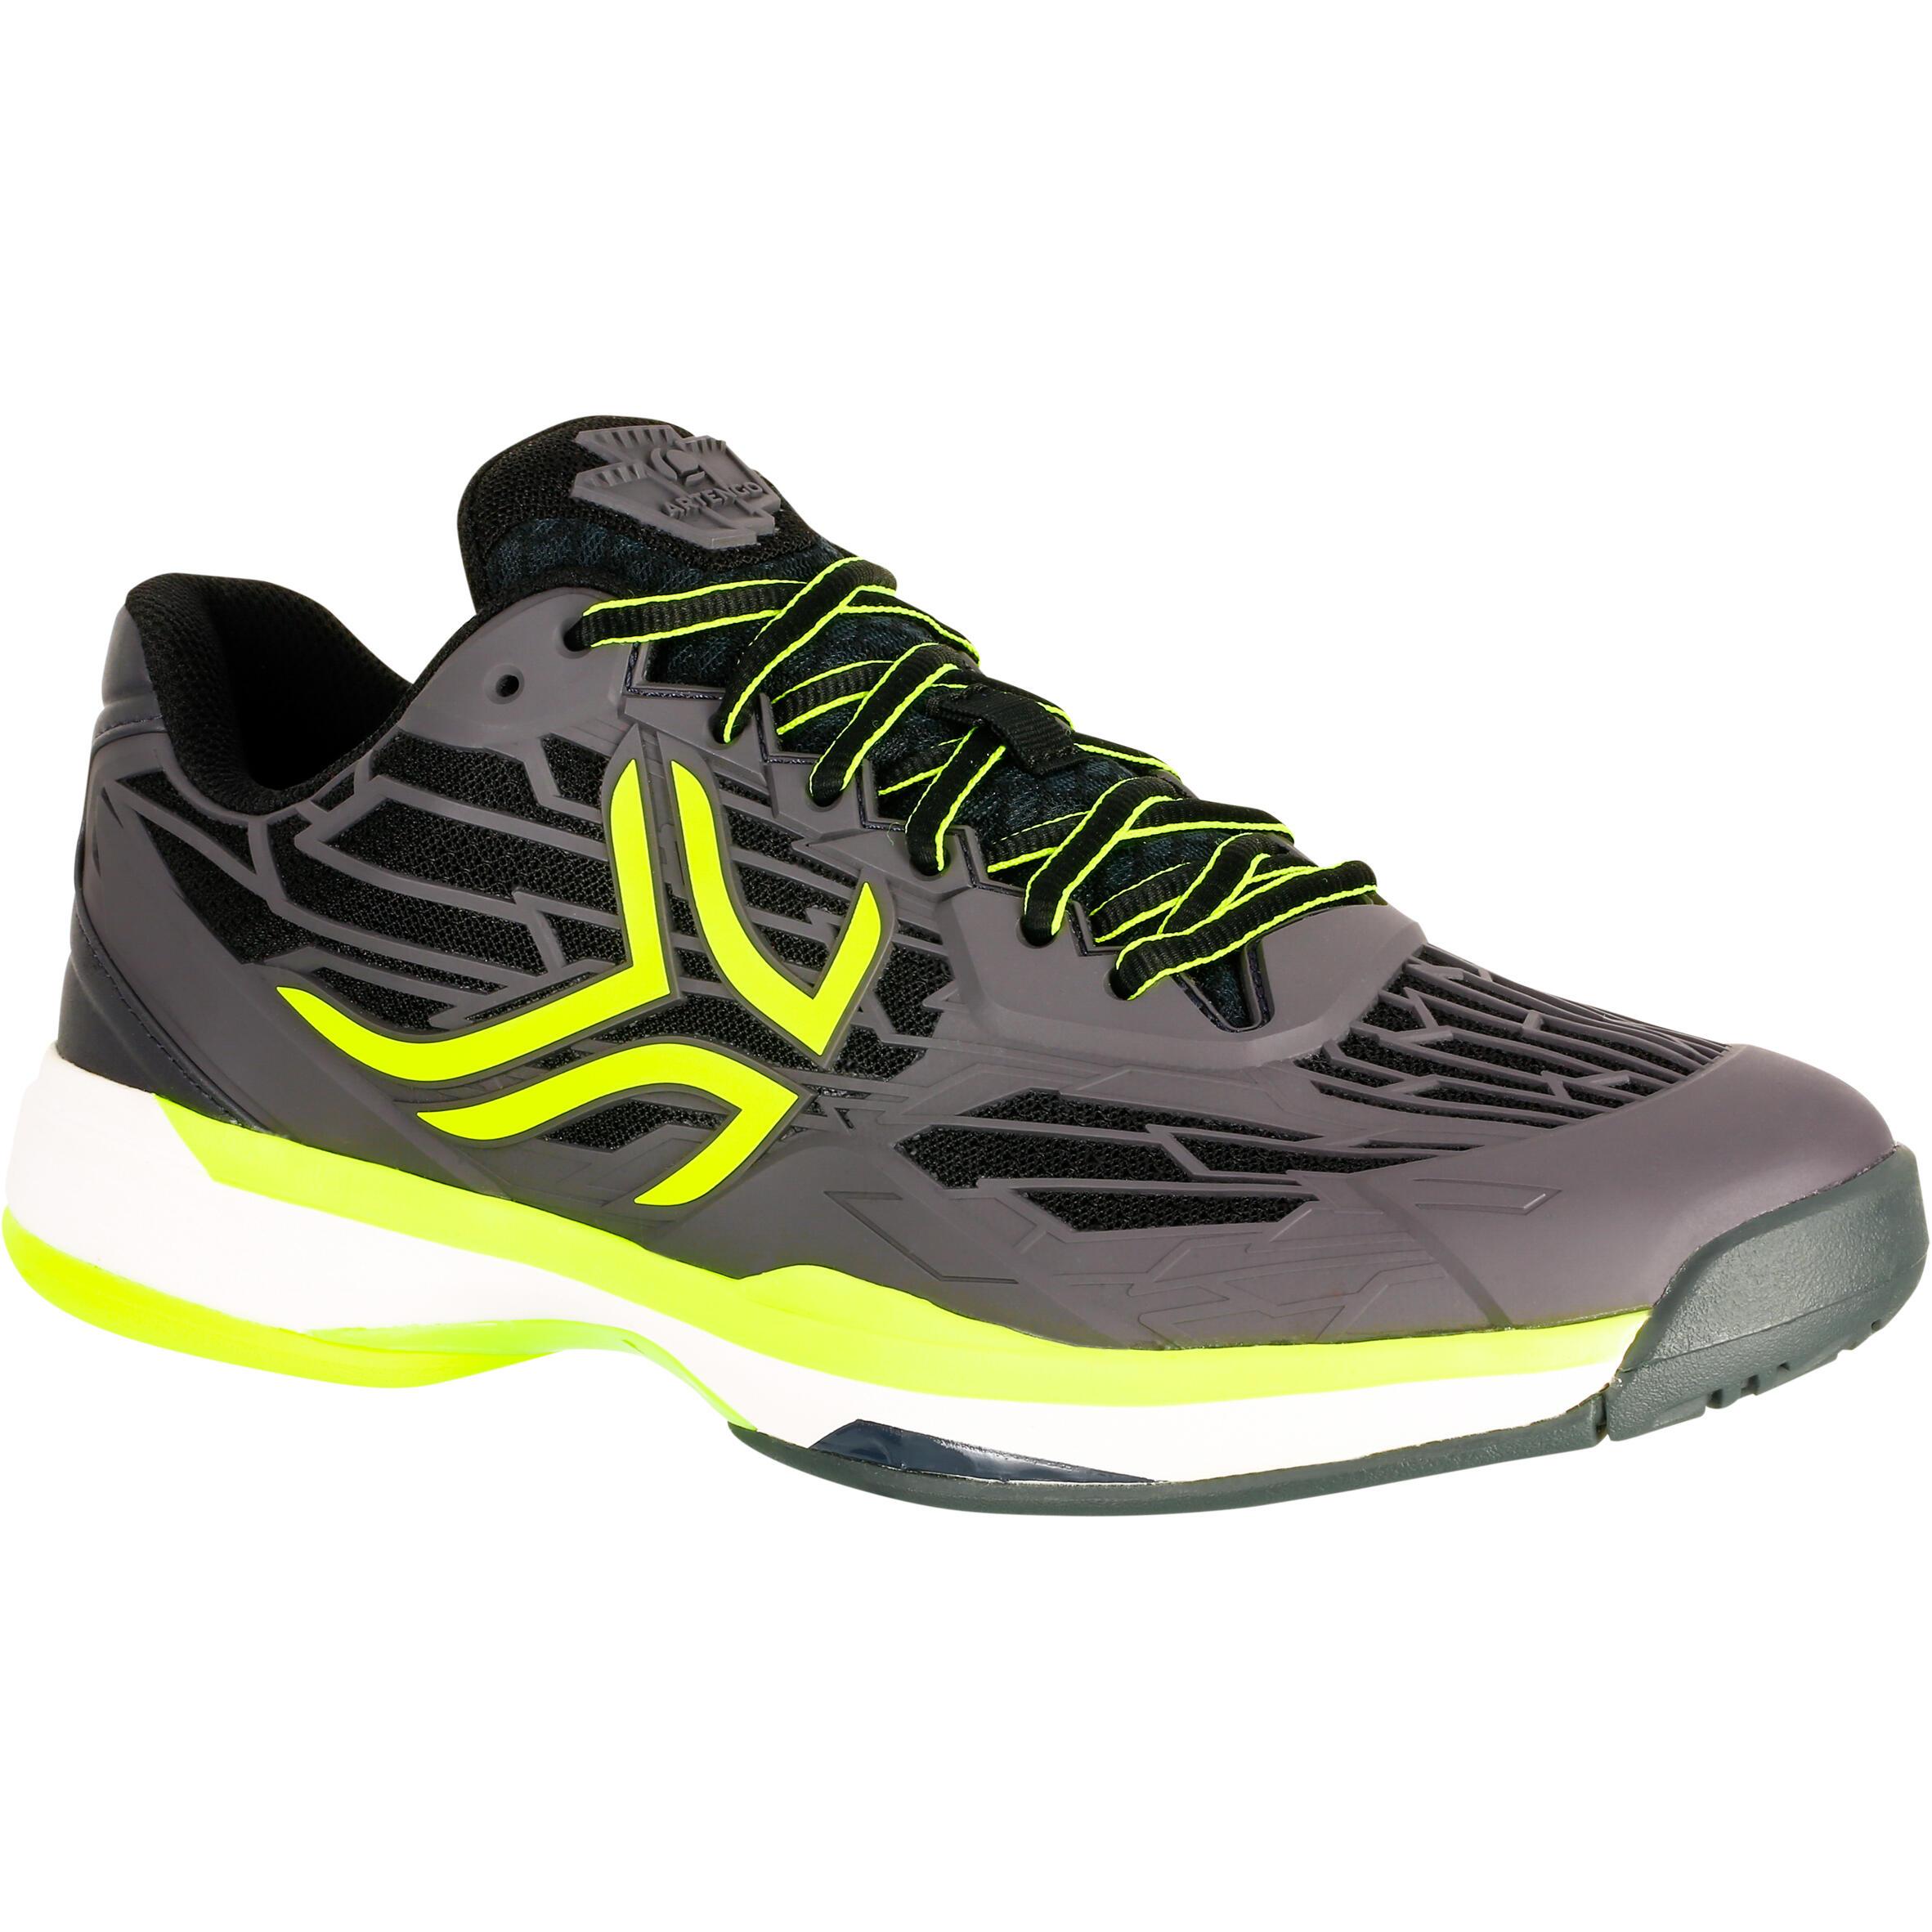 Chaussures Homme Ts990 Jaune De Tennis N0wvn8mO